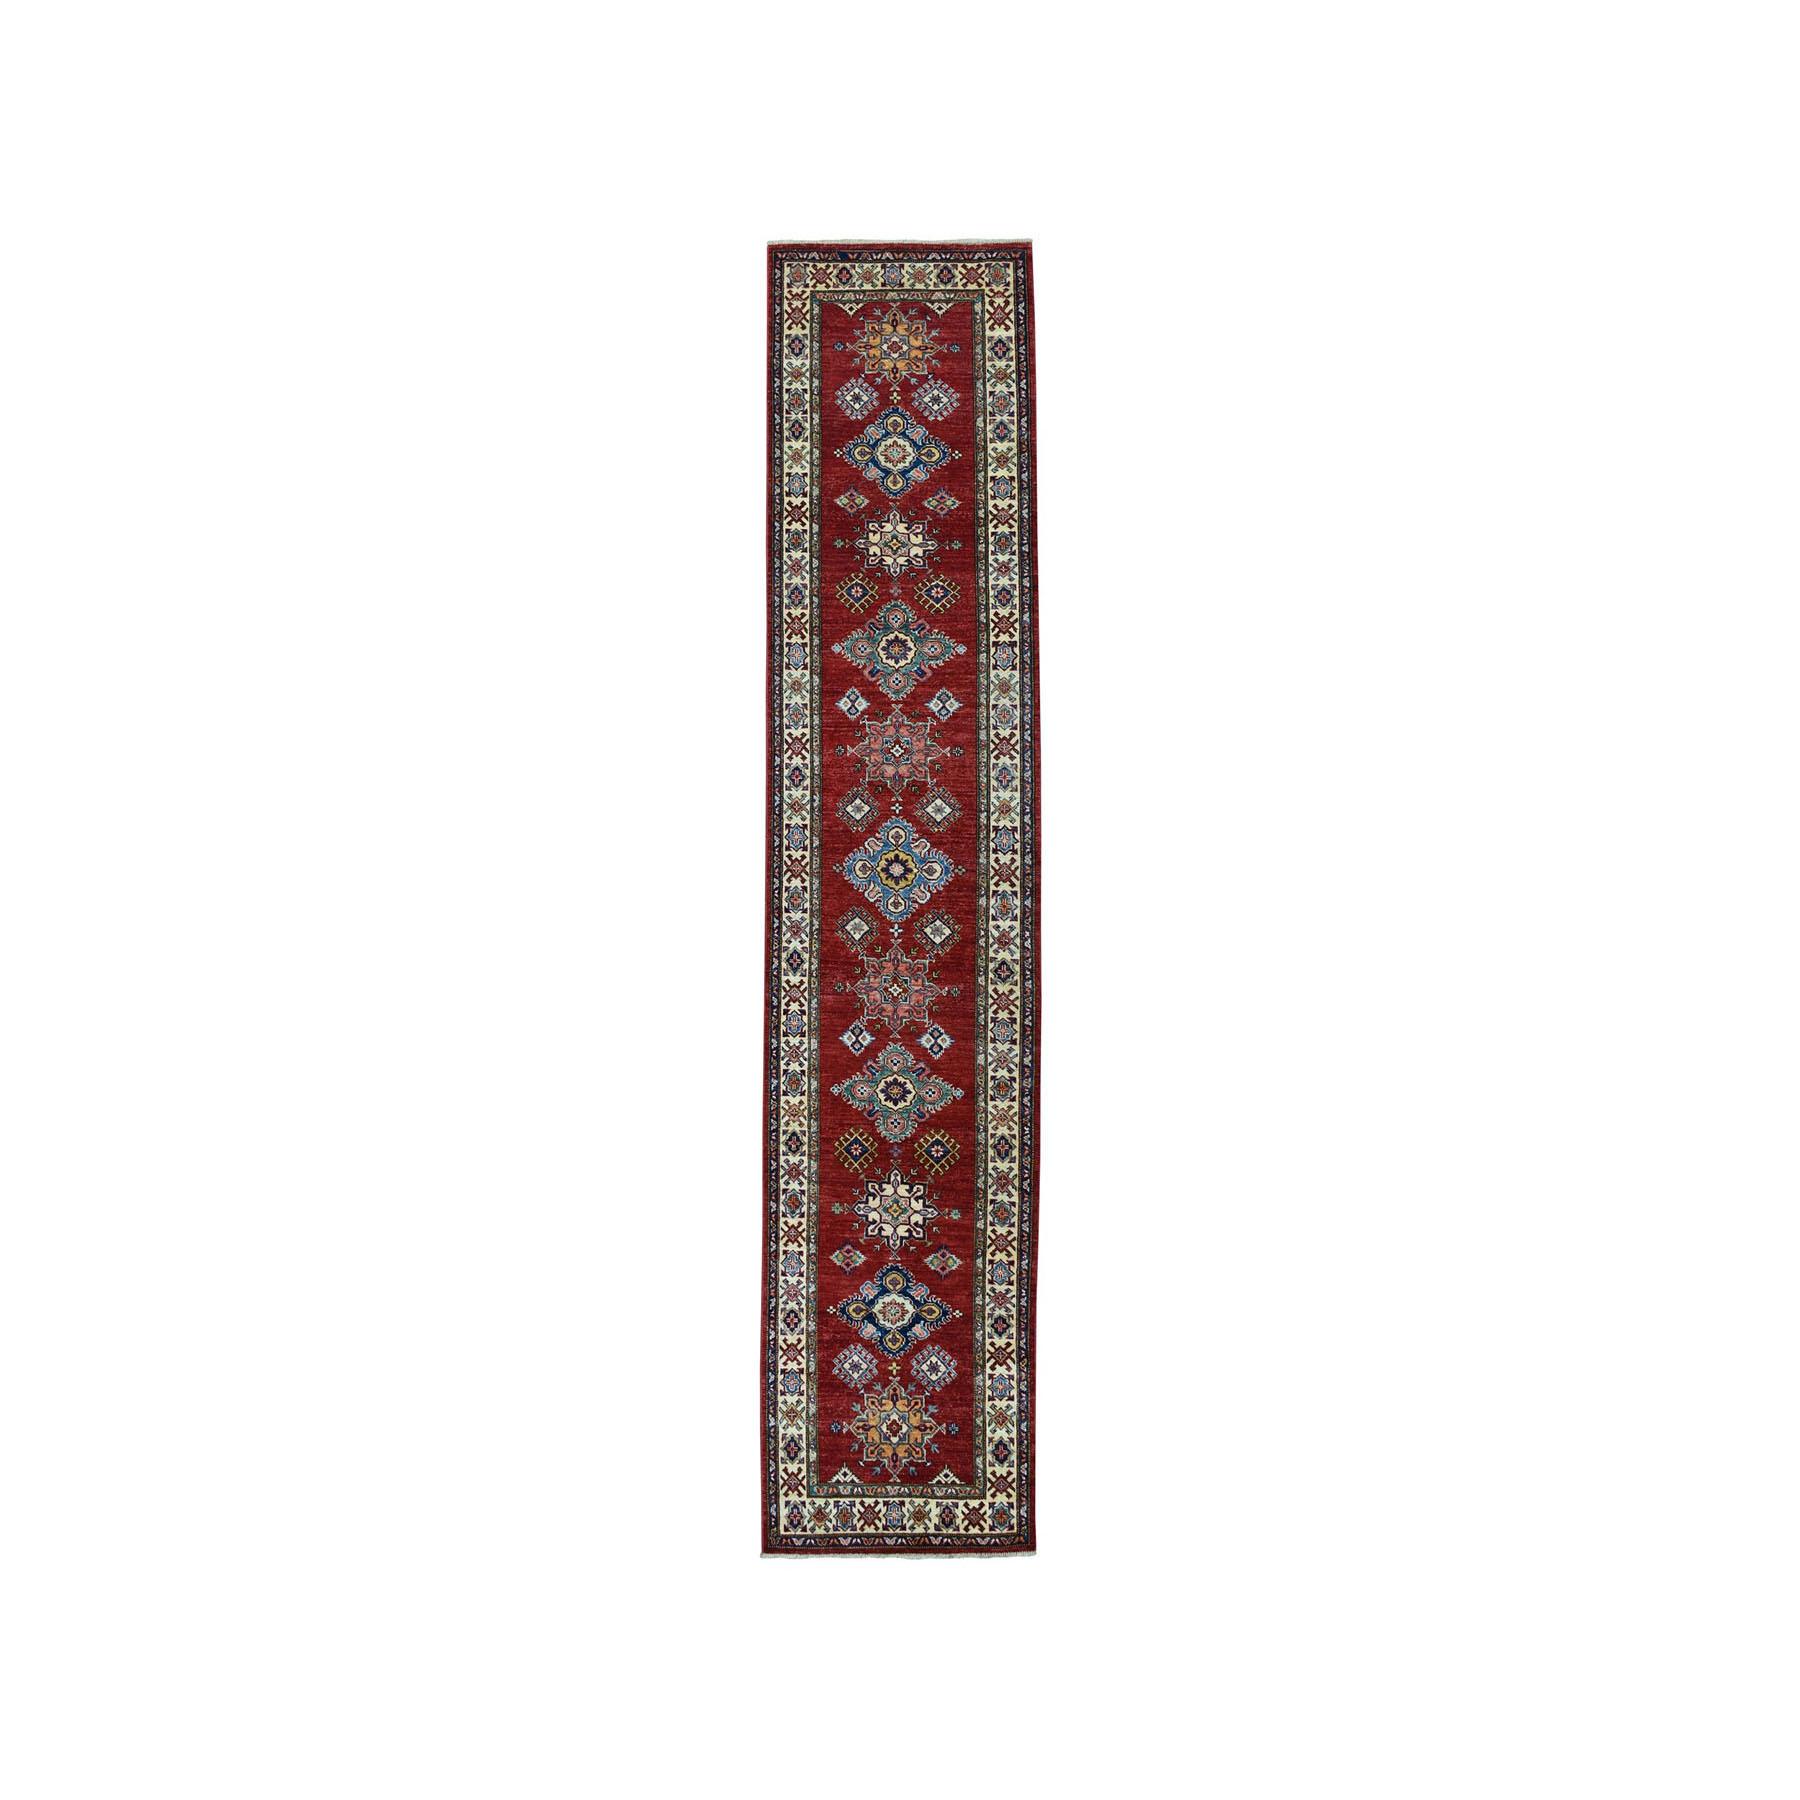 "2'9""X10'9"" Red Super Kazak Pure Wool Geometric Design Hand-Knotted Runner Oriental Rug moae060d"